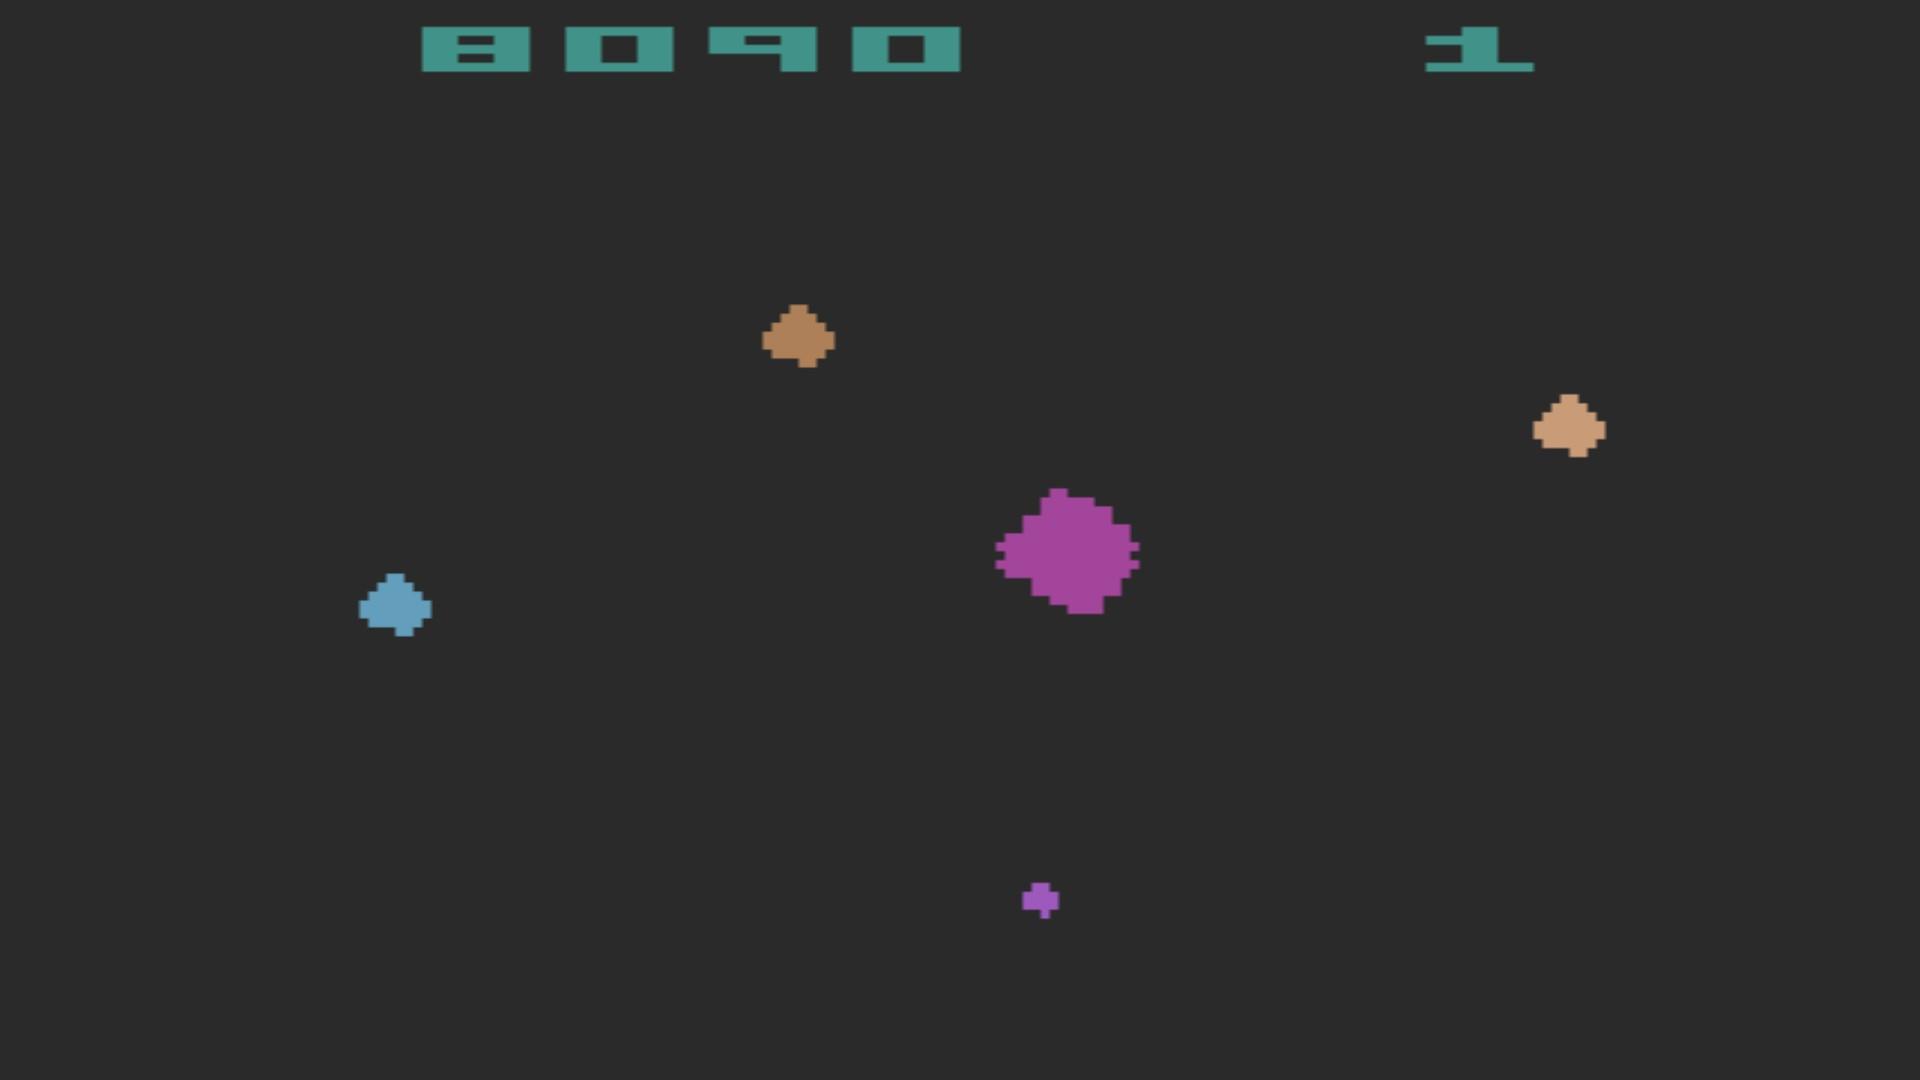 AkinNahtanoj: Asteroids (Atari 2600 Emulated Novice/B Mode) 8,090 points on 2020-10-11 13:20:56